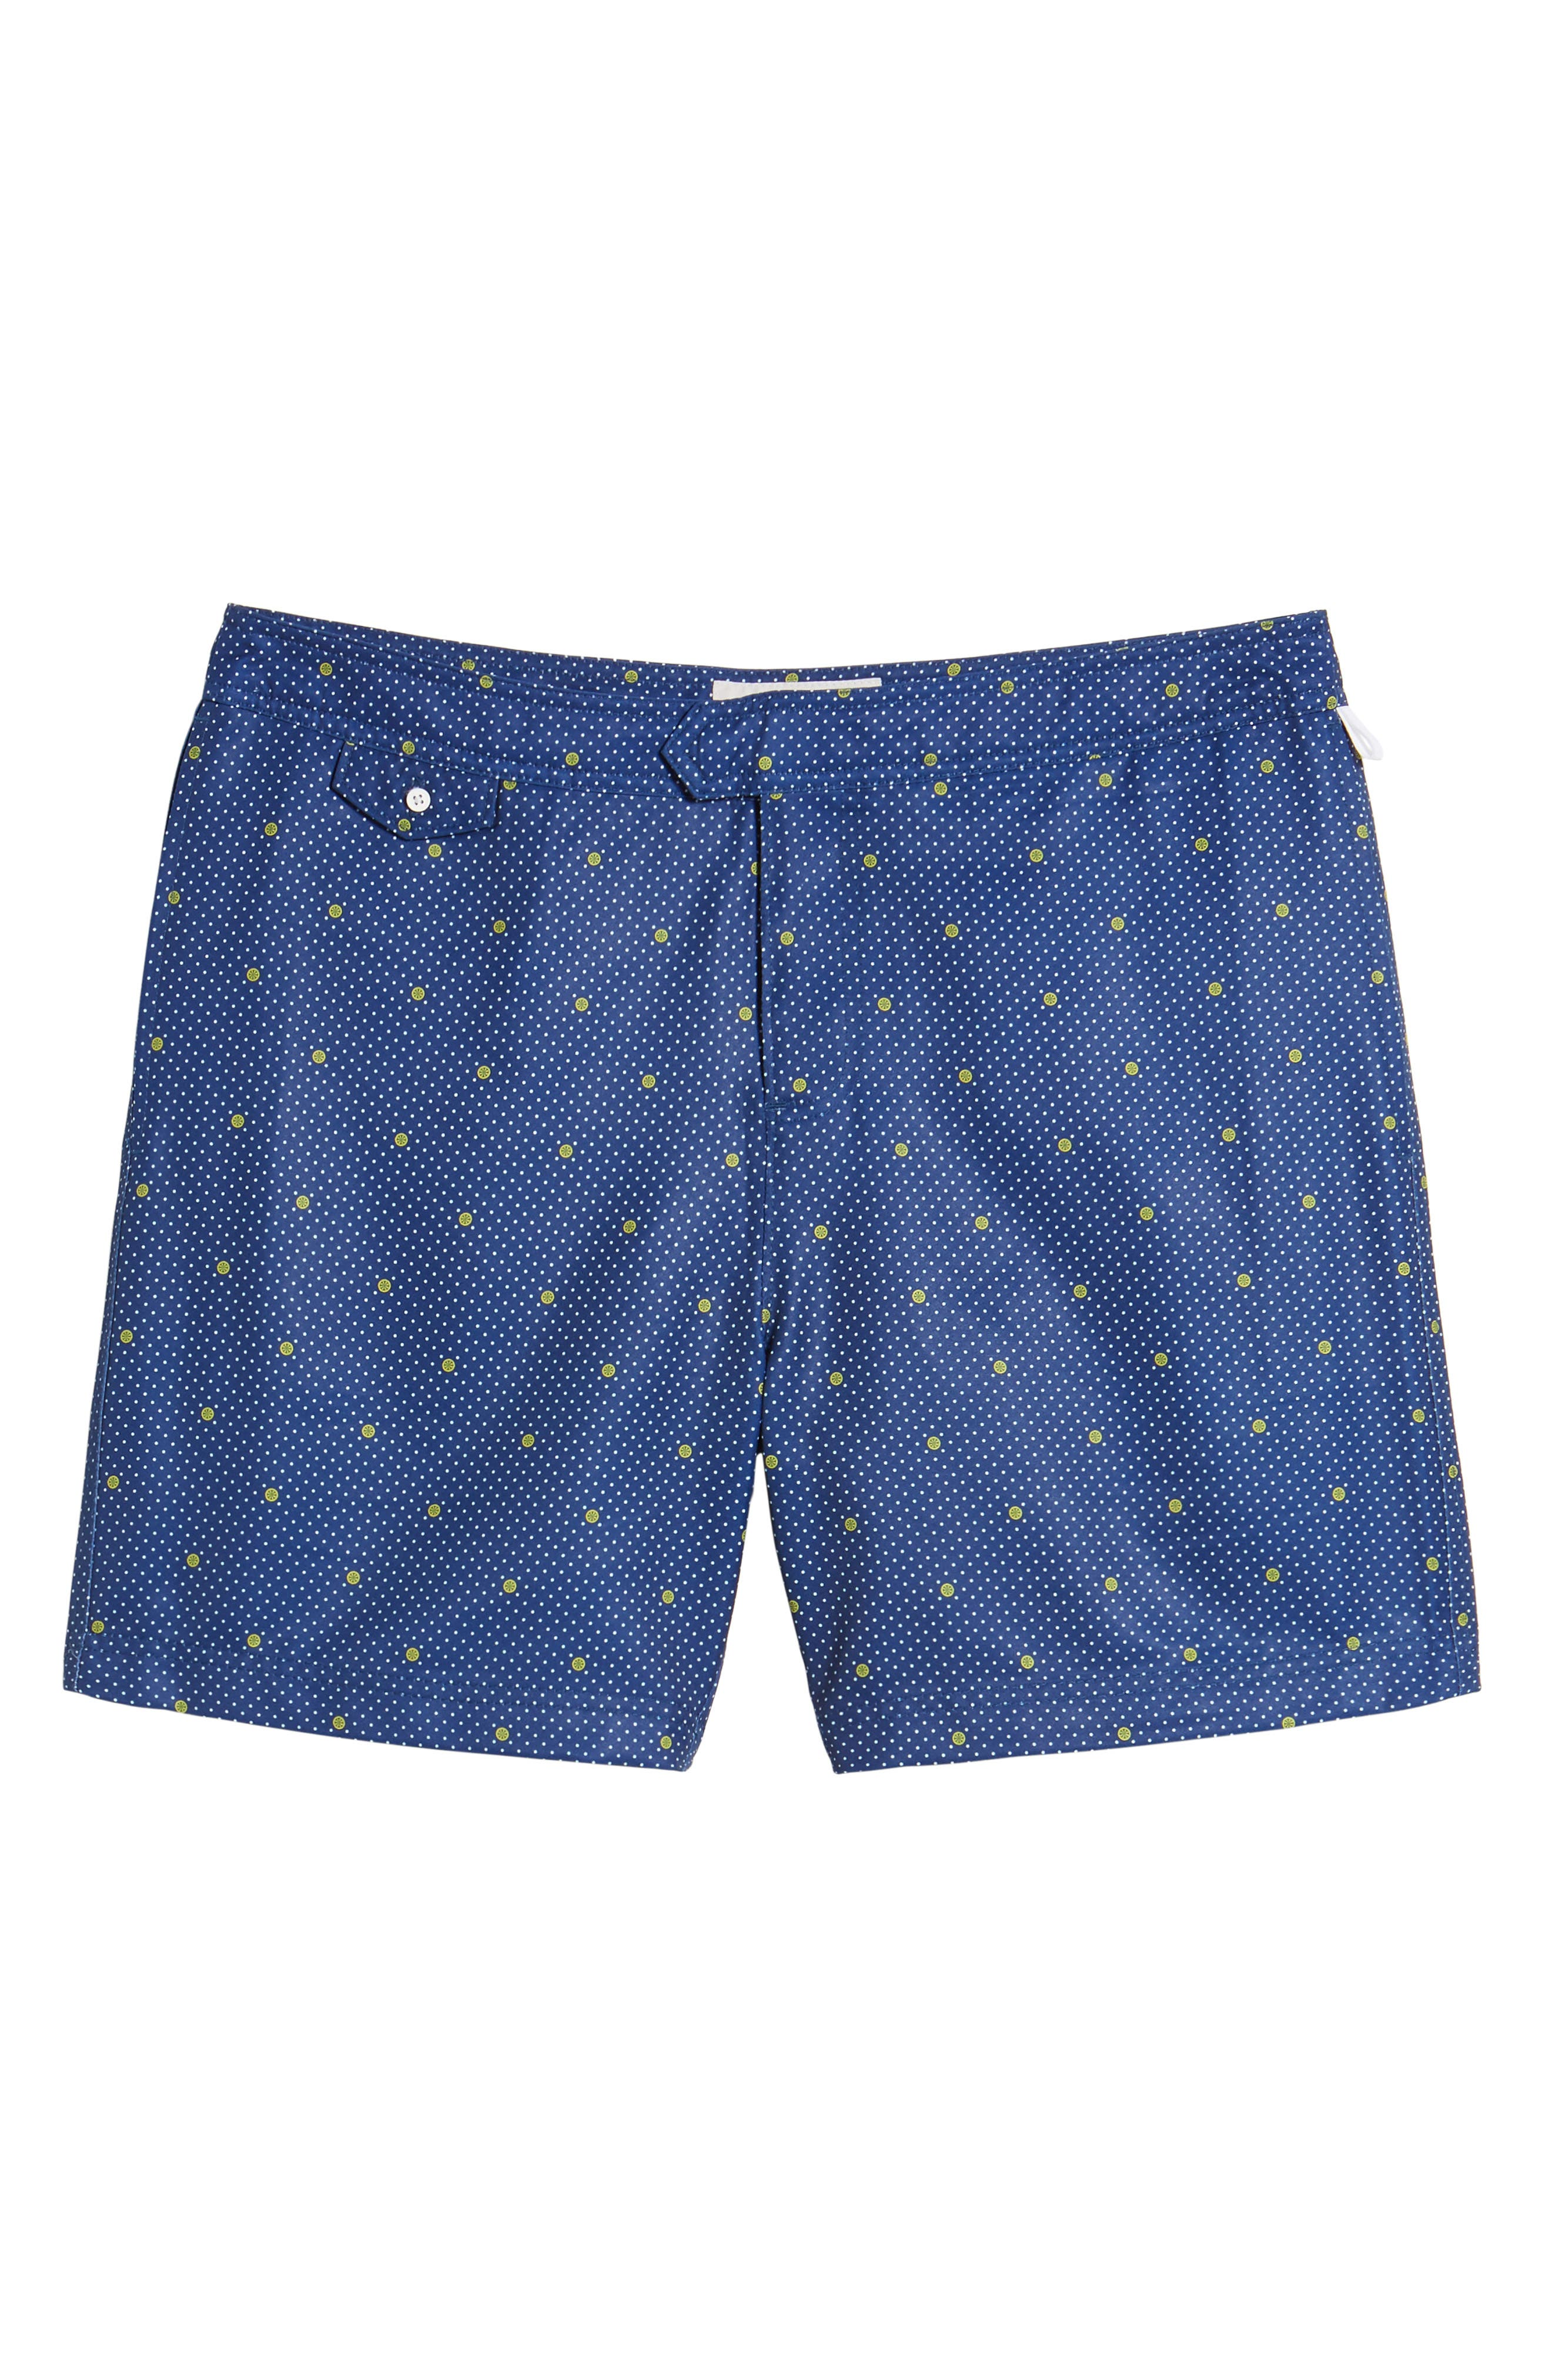 Polka Dot Lemon Volley Board Shorts,                             Alternate thumbnail 6, color,                             469